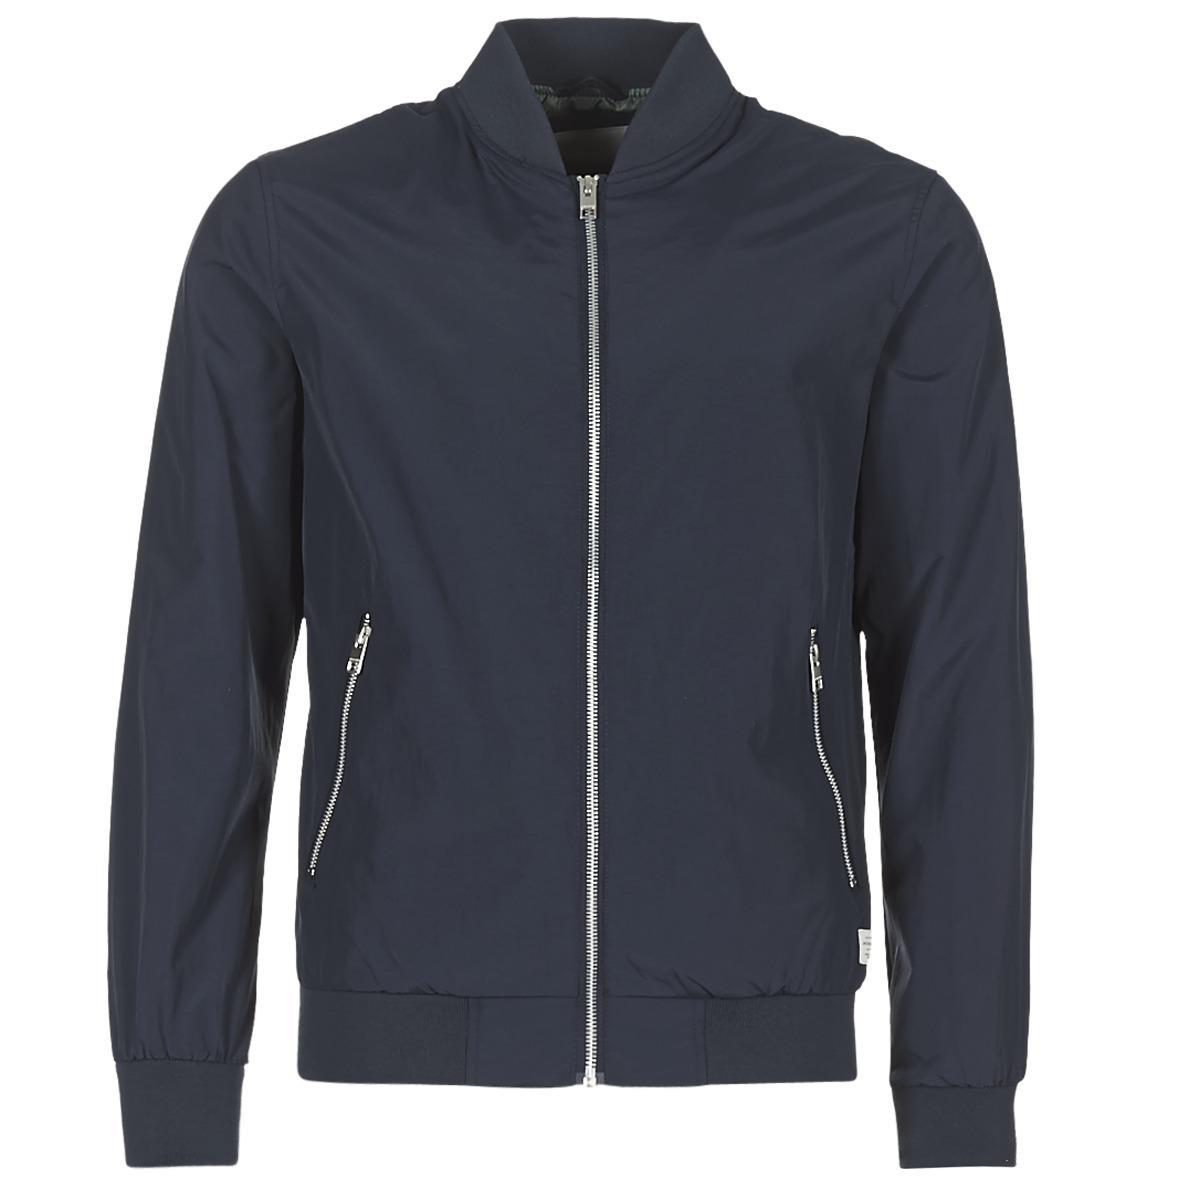 0939d2bdc95436 Jack   Jones Jornew Pacific Jacket in Blue for Men - Lyst